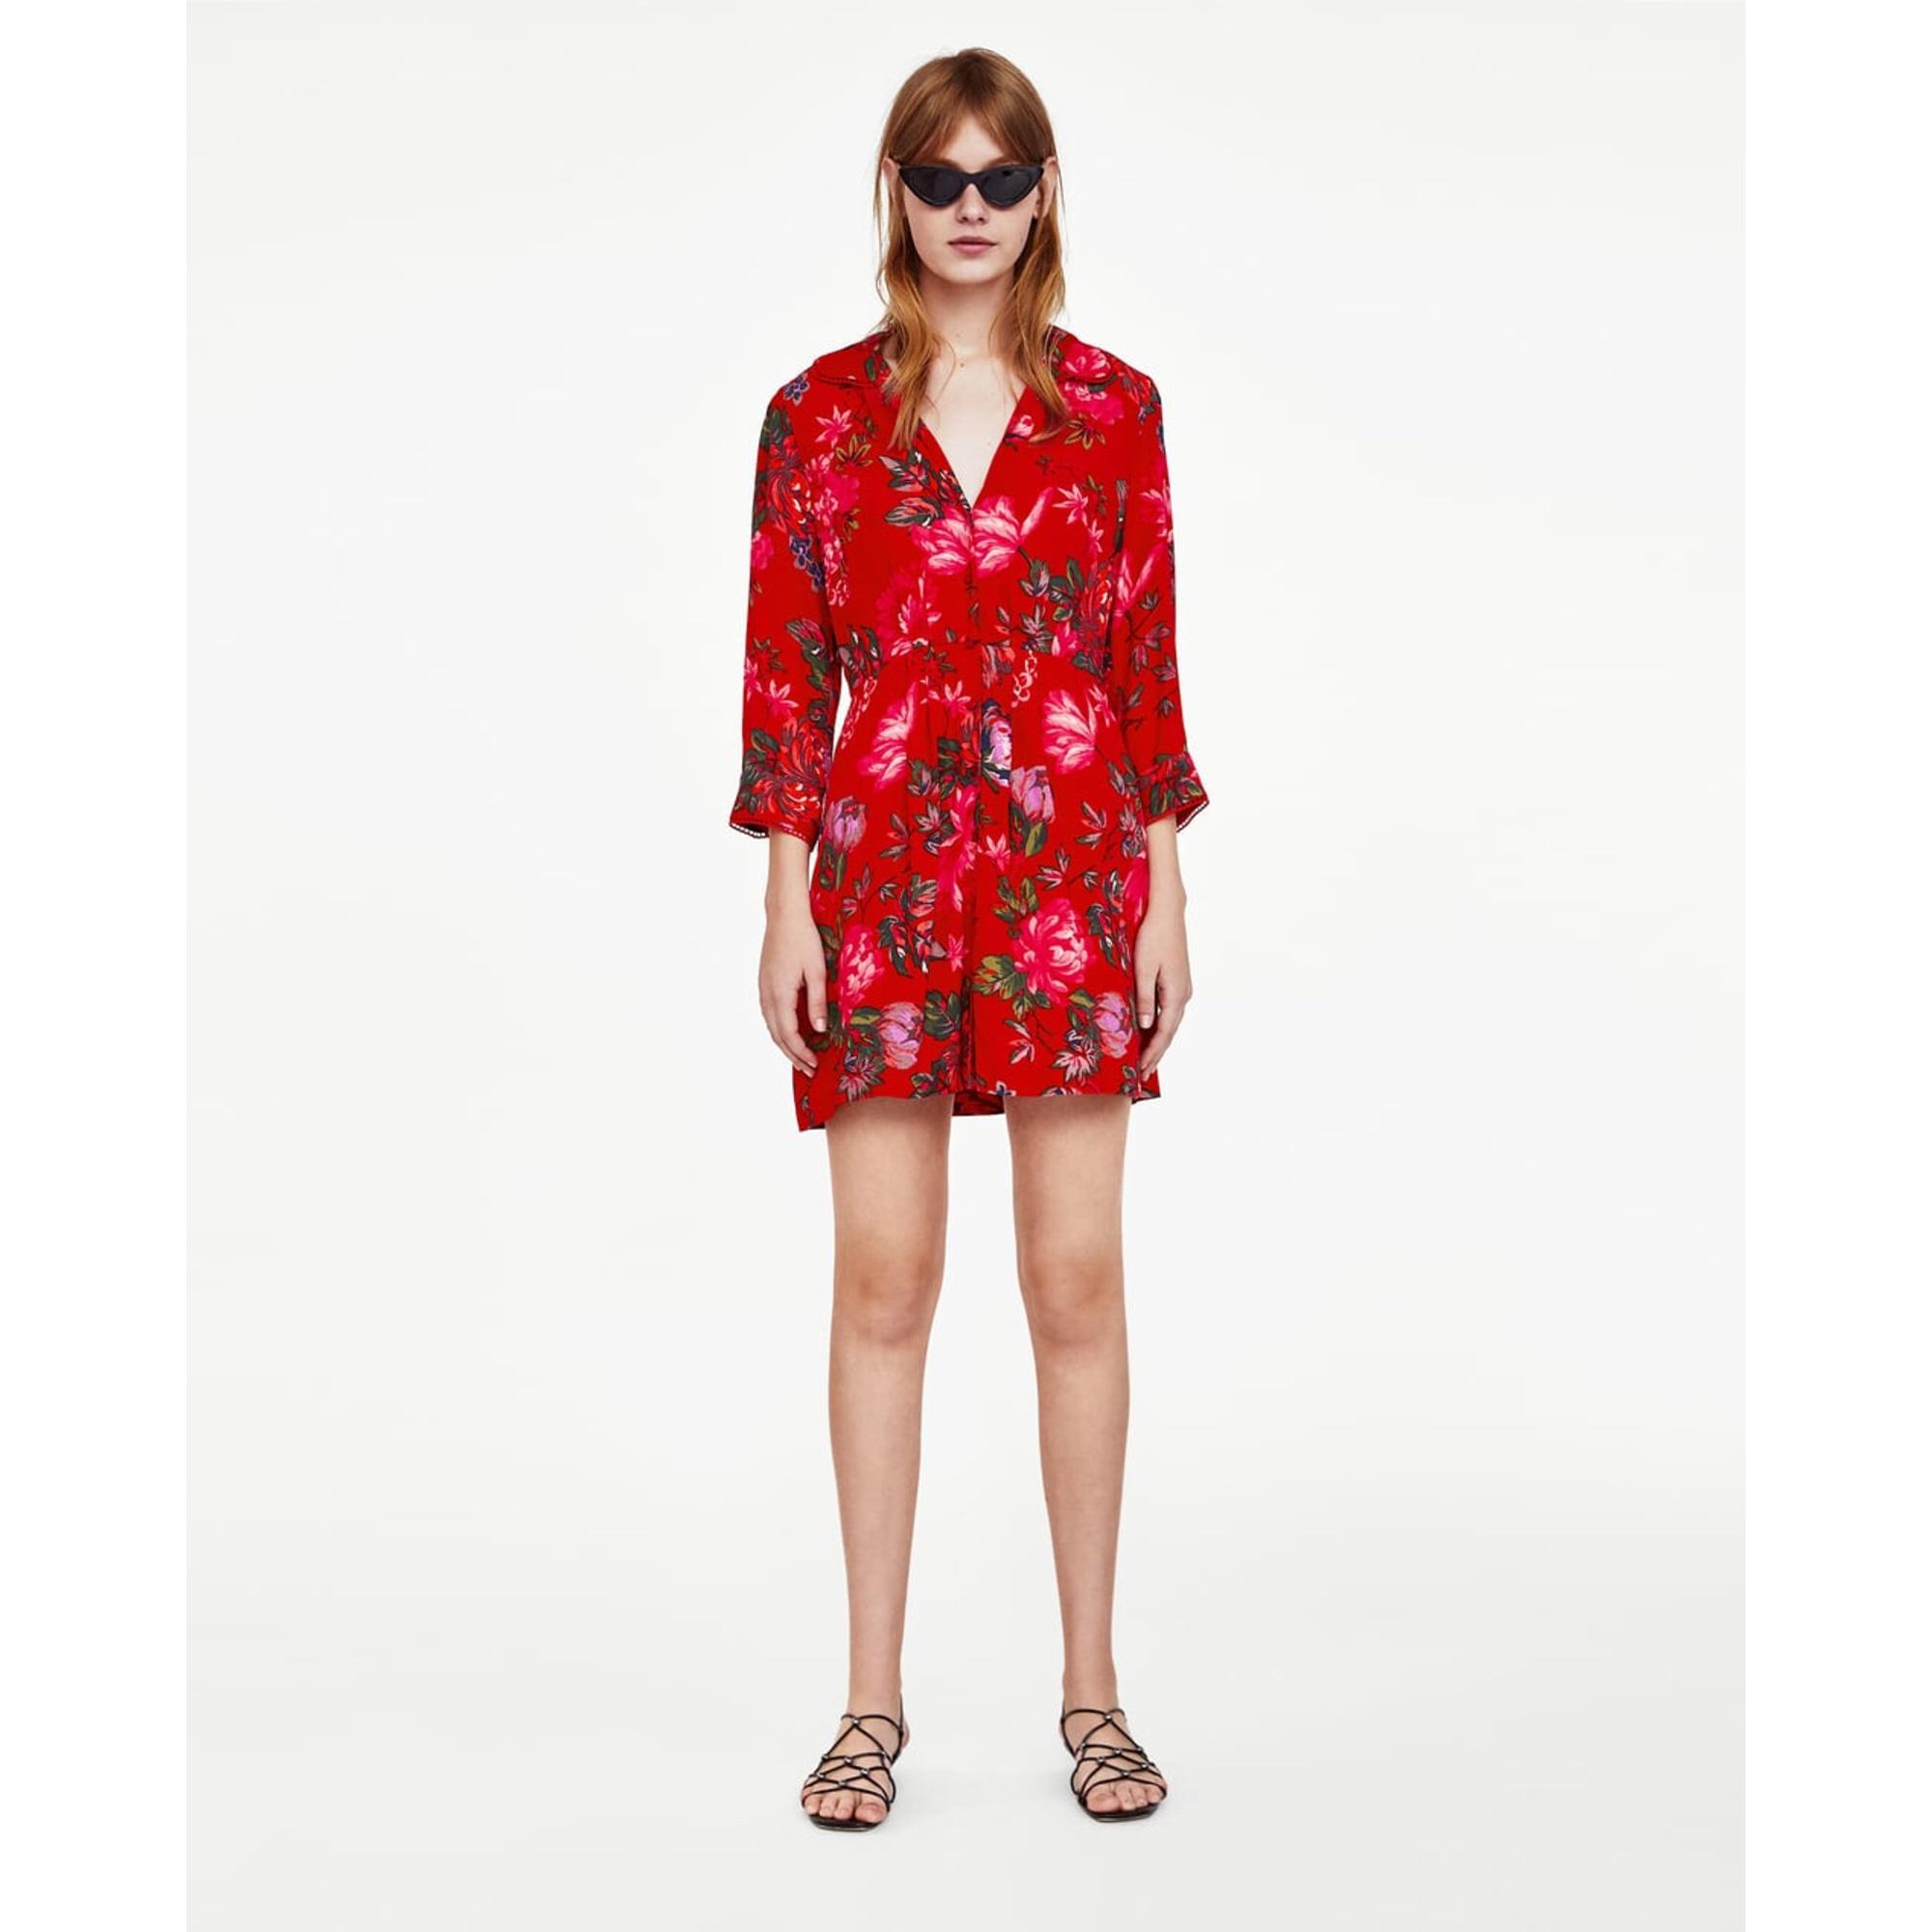 Robe Courte Zara 36 S T1 Rouge 7611200